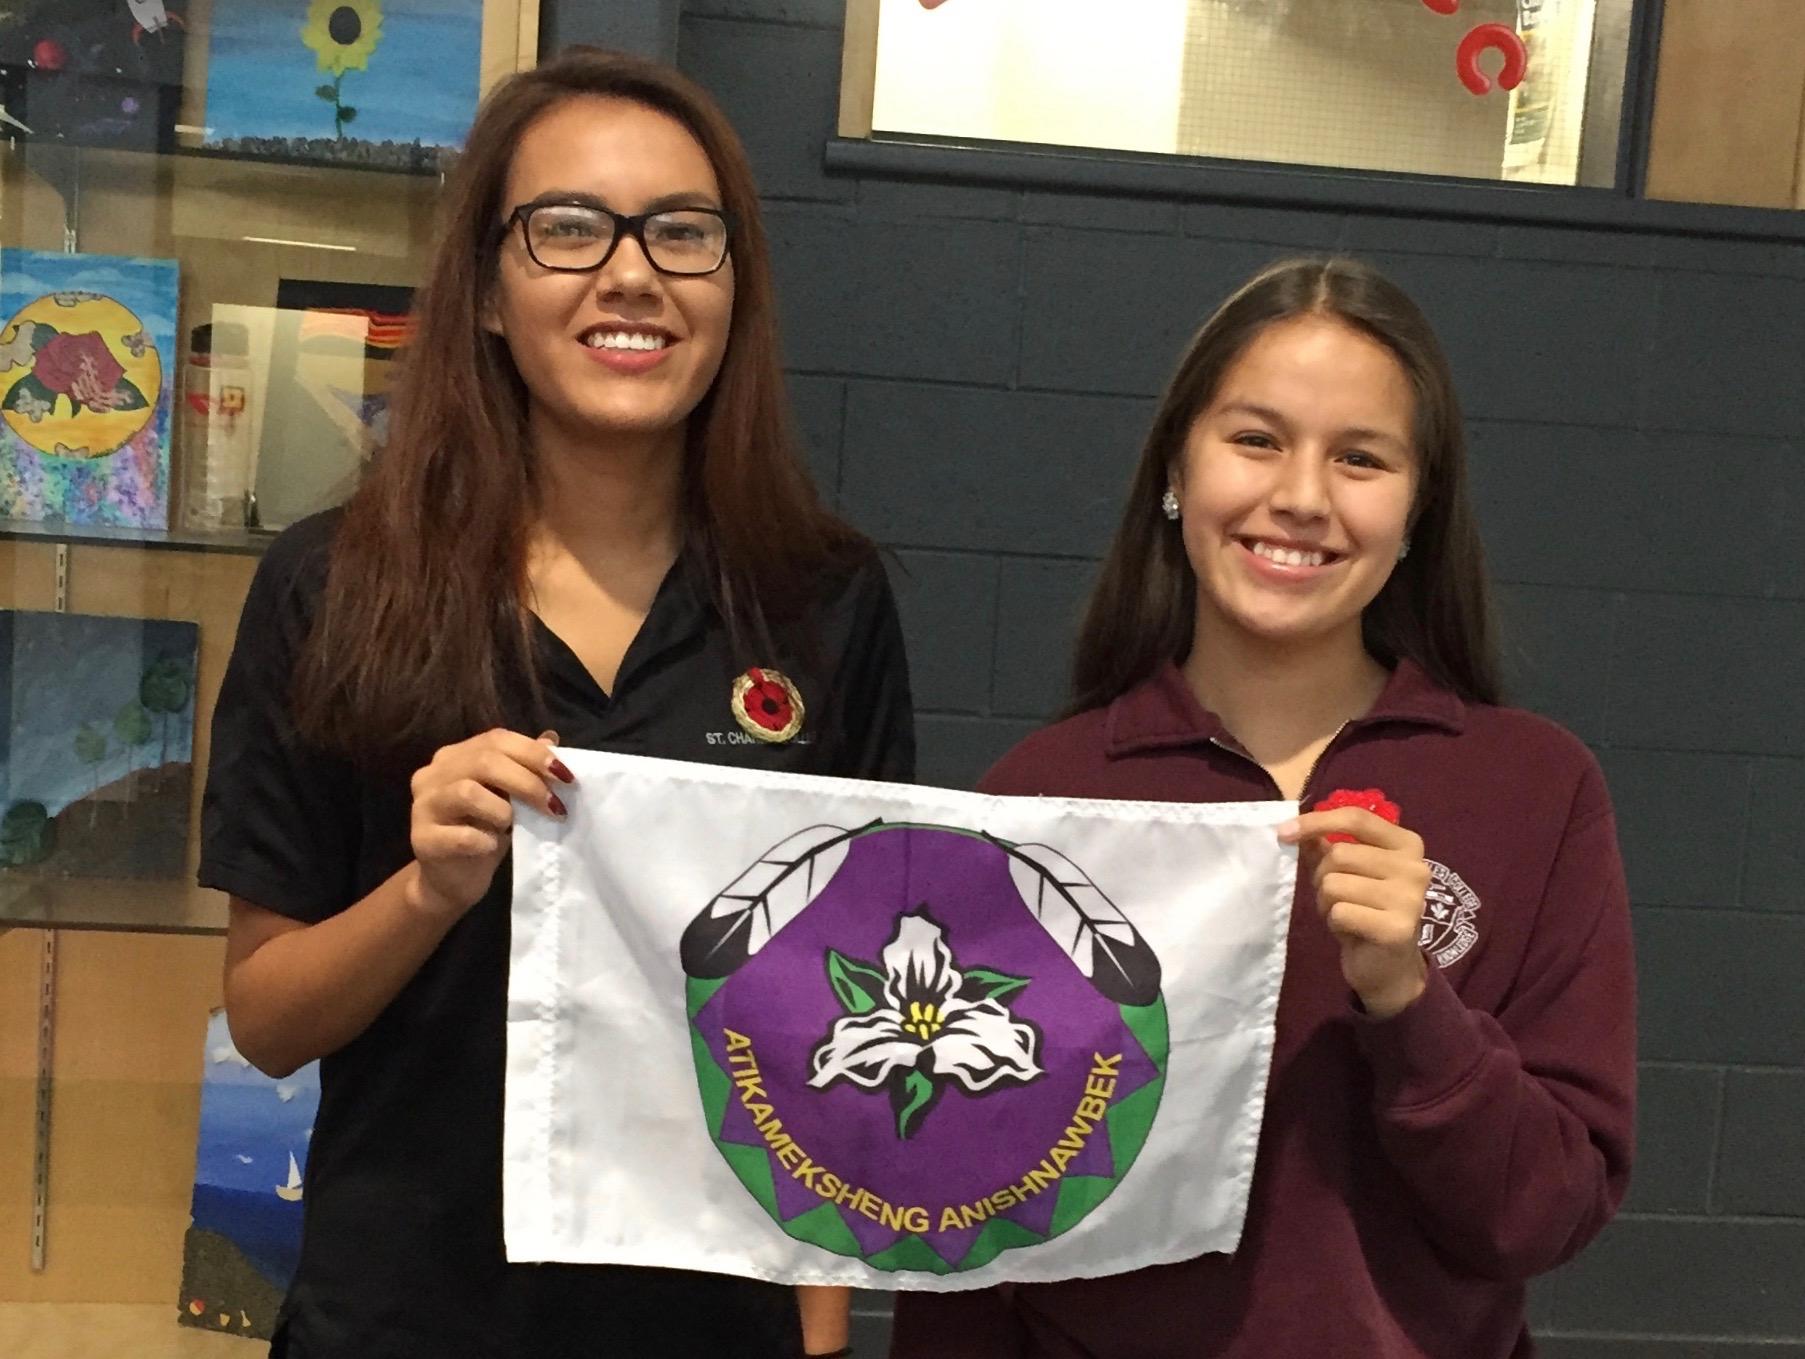 Two students hold the Atikameksheng Anishnawbek flag.